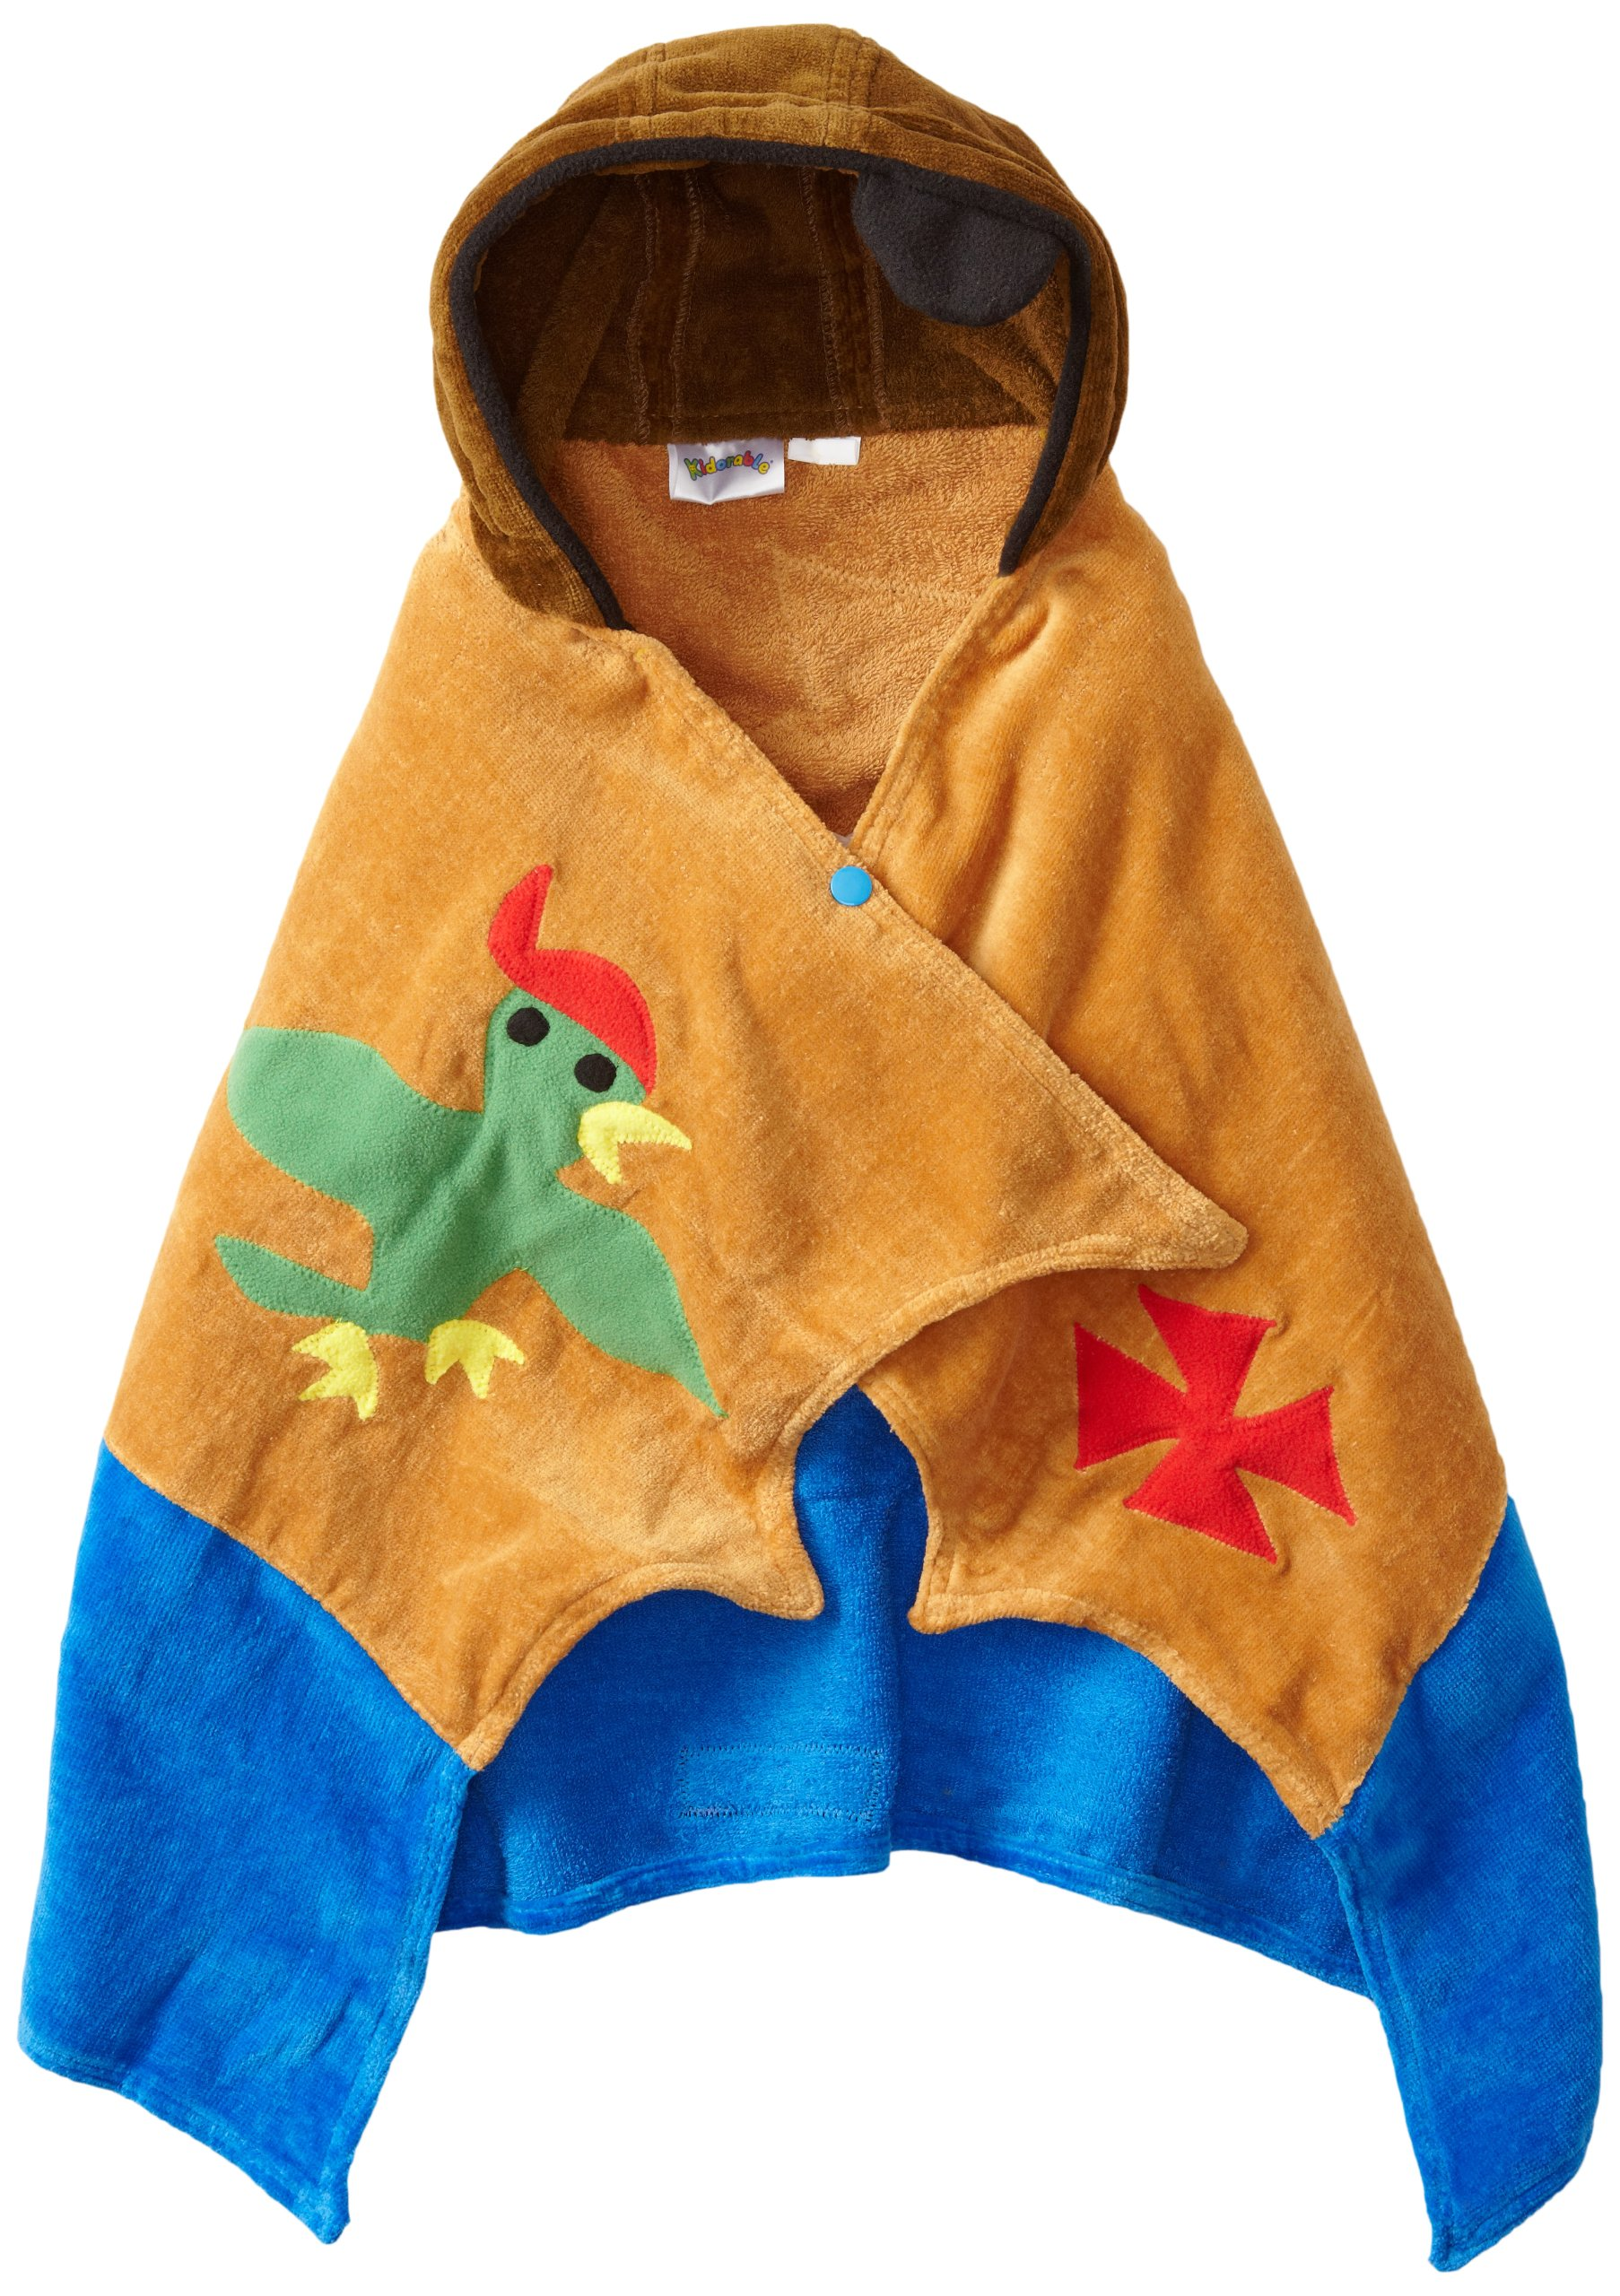 Kidorable Pirate Toddler Towel, Brown, Medium, 3-6 Years by Kidorable (Image #1)